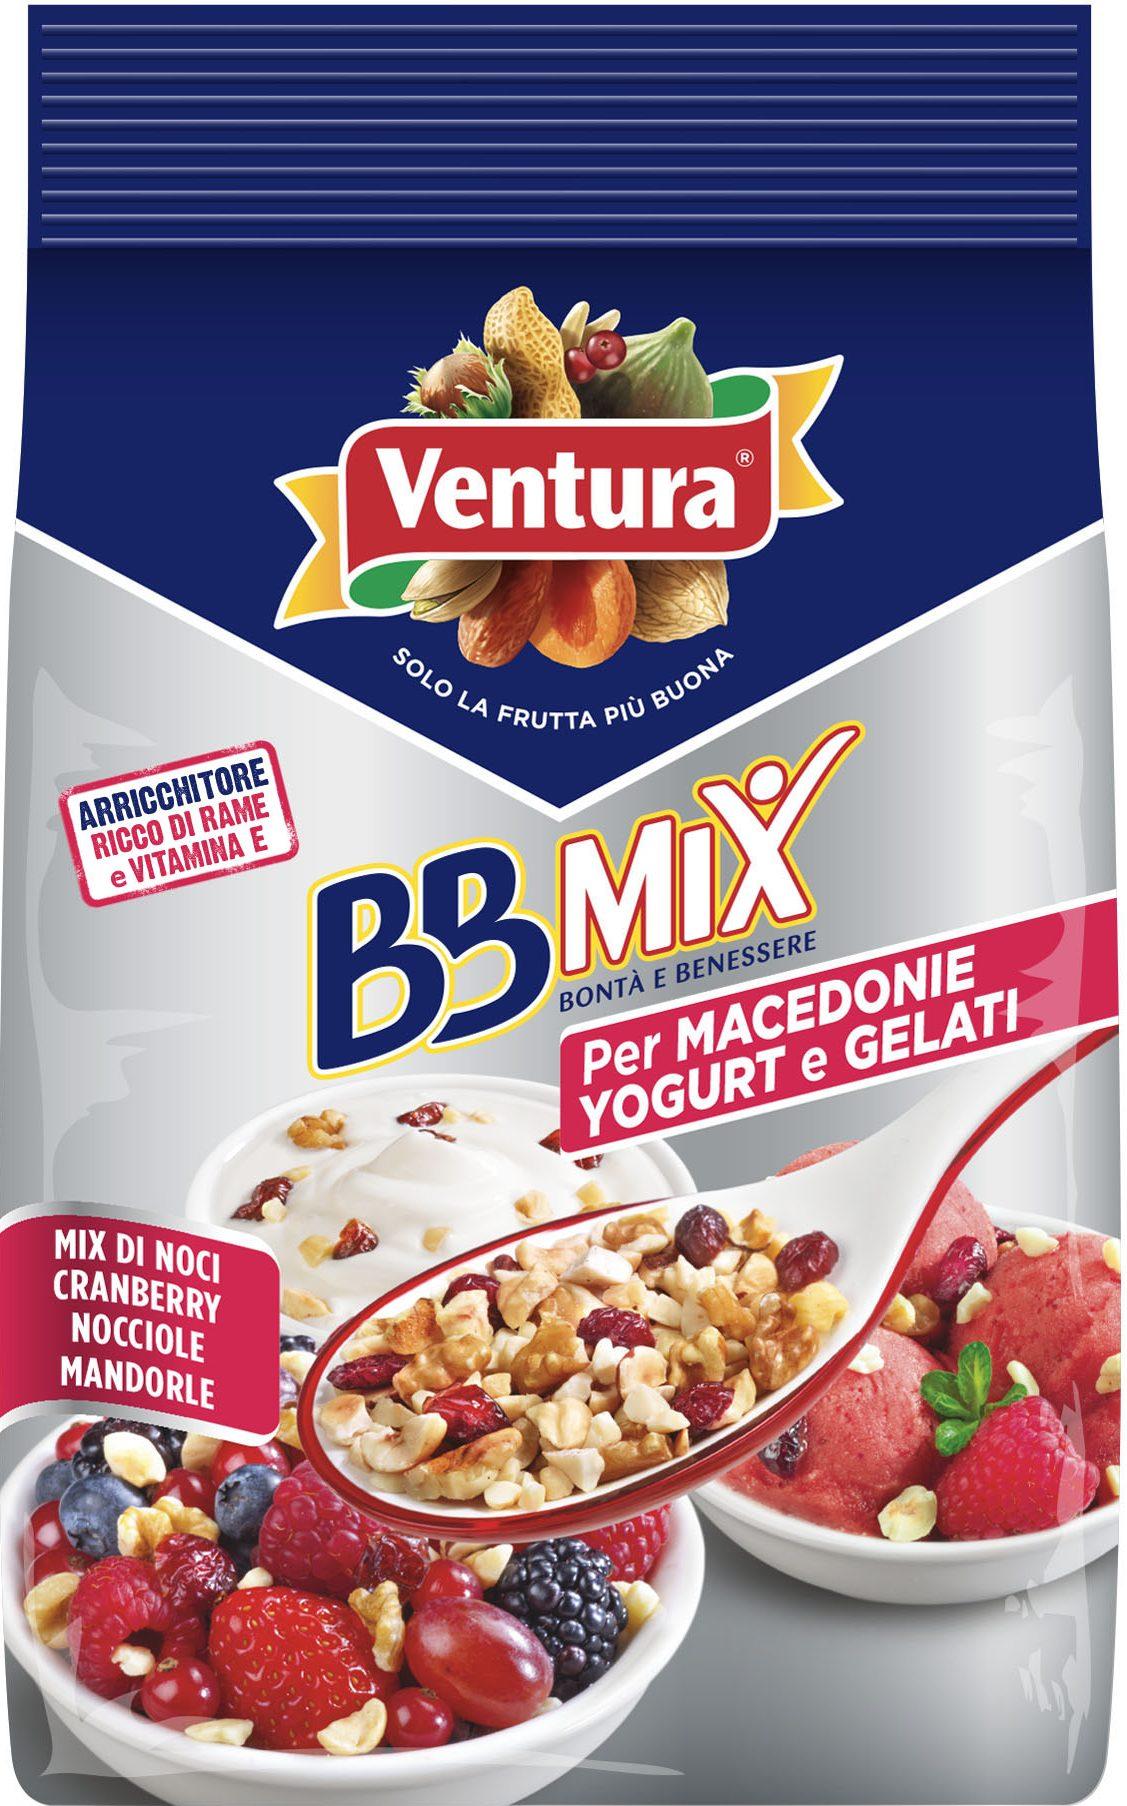 BBMix per macedonie, yogurt e gelati